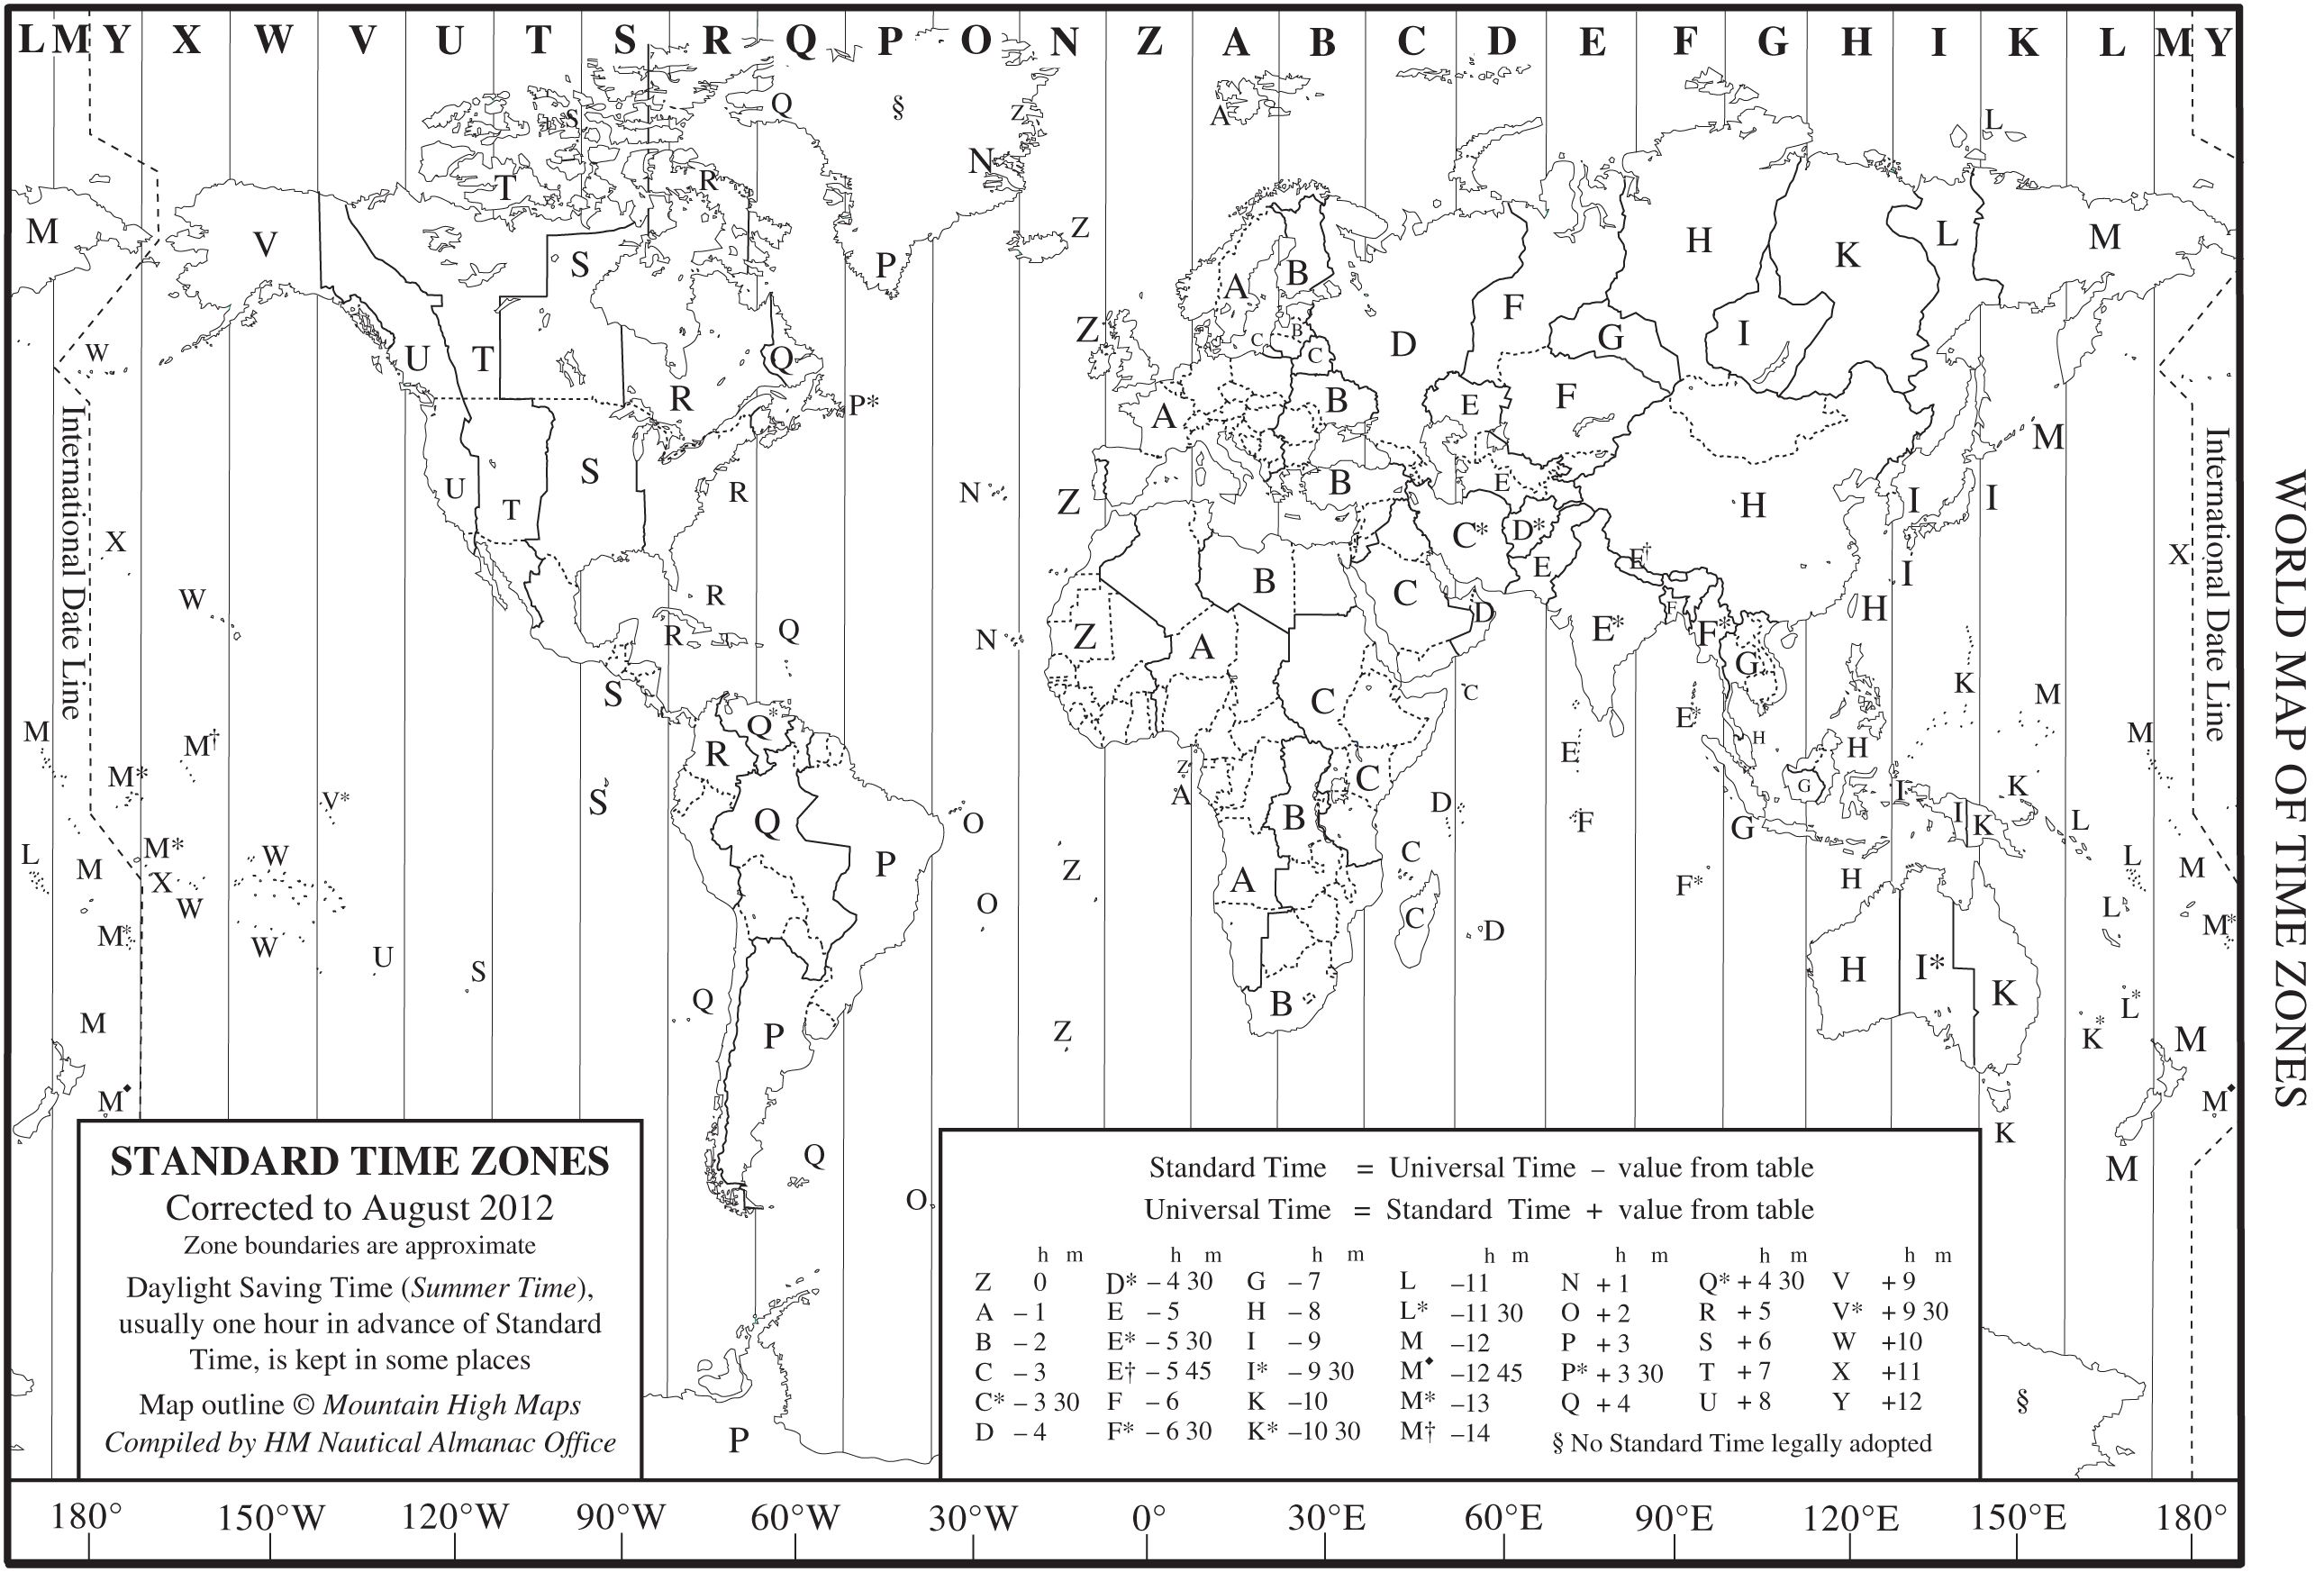 hight resolution of http://aa.usno.navy.mil/graphics/TimeZoneMap0812.jpg   World time zones